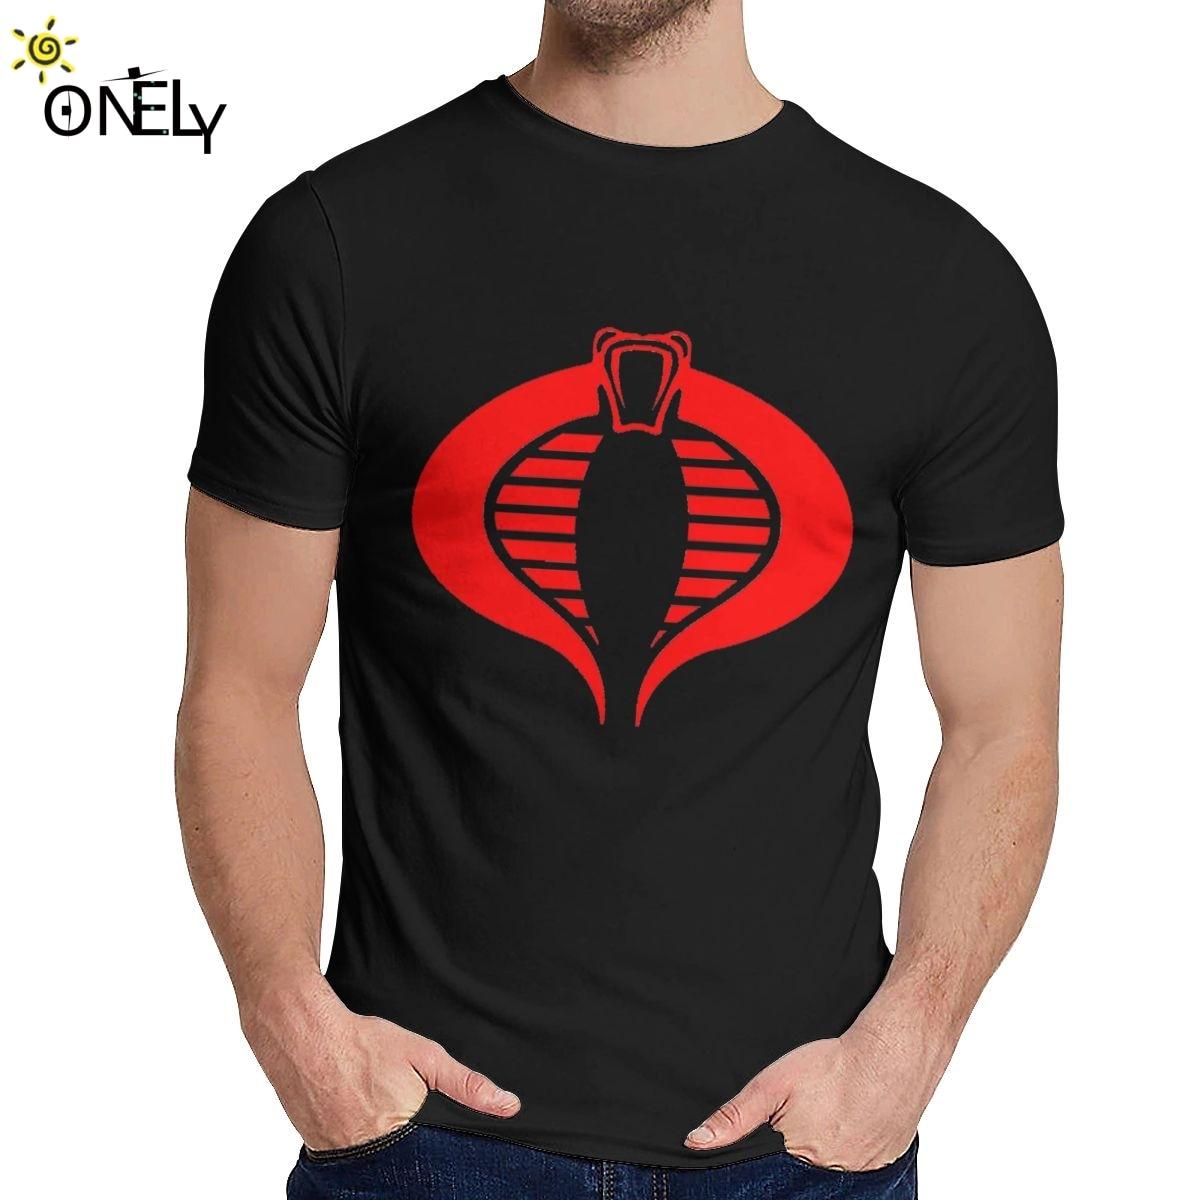 Круглый воротник Кобра GI JOE спецназ короткий рукав лето для мужчин 100% хлопок Homme футболка большой размер